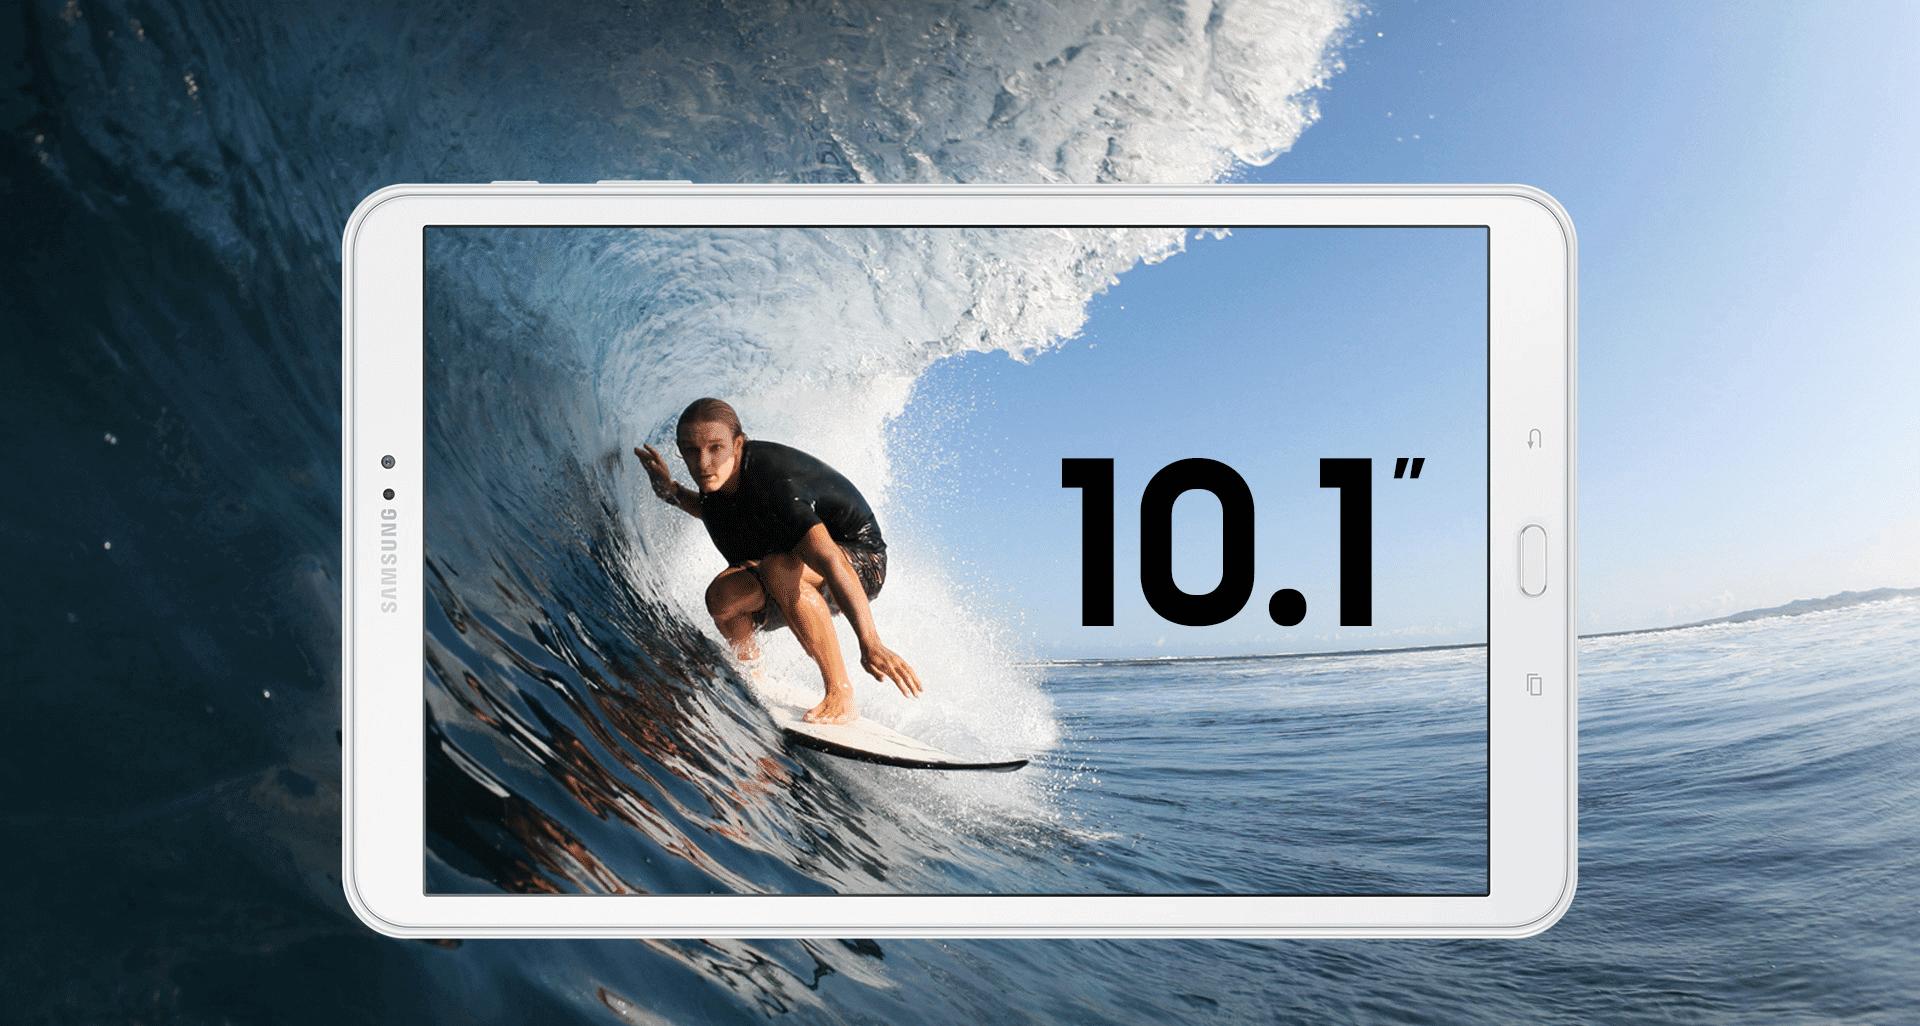 Install KXU1BQD9 Android 7.0 Nougat on Samsung Galaxy Tab A 10.1 1